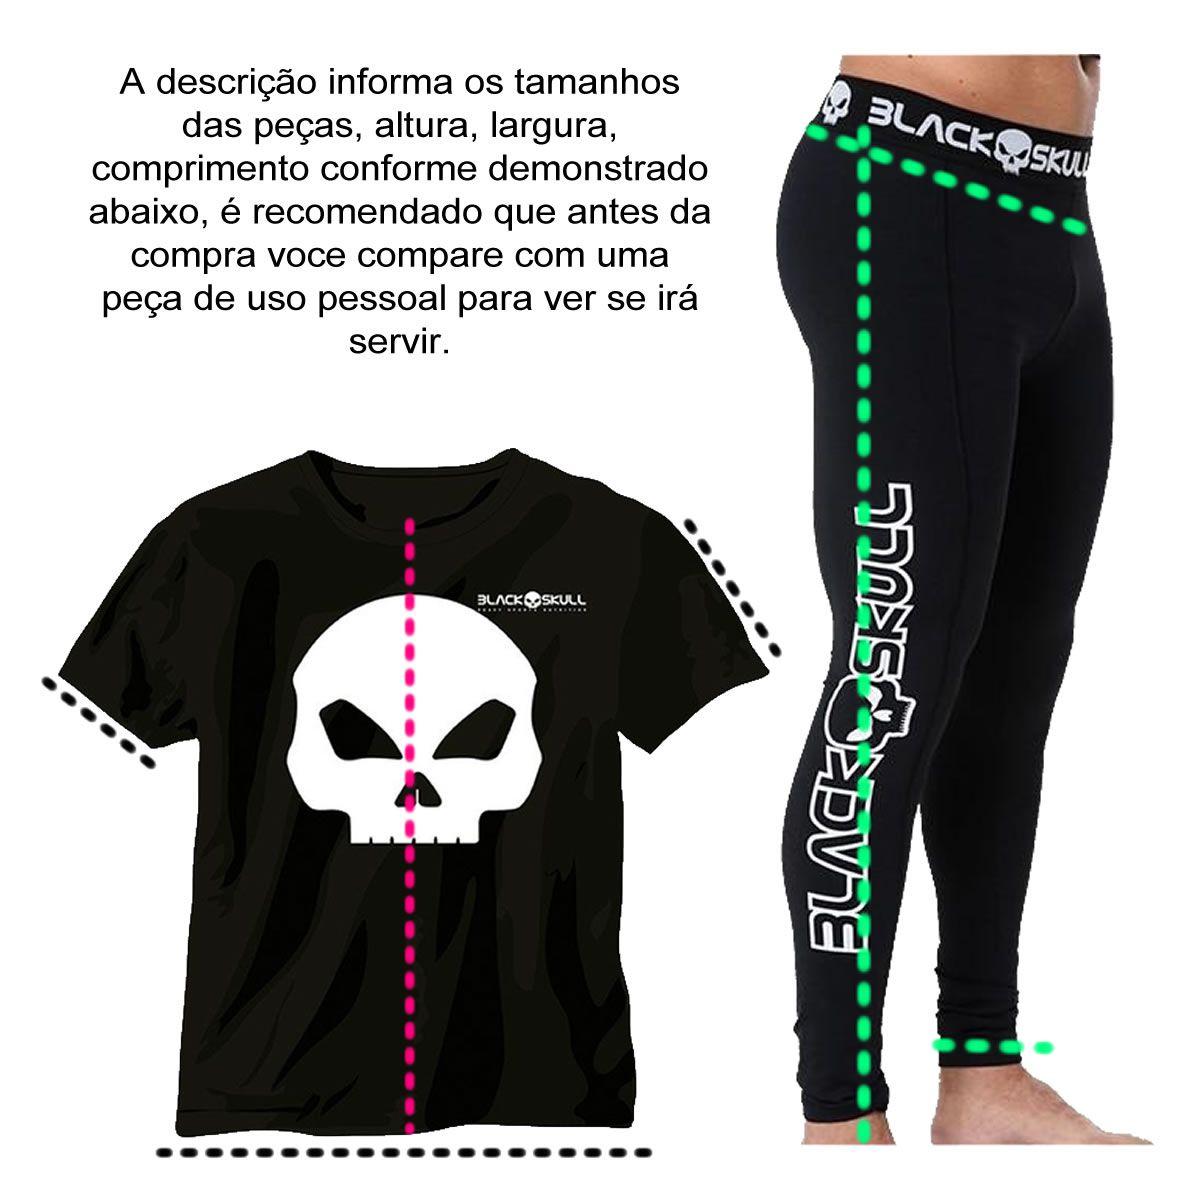 Casaco Skull Preto - Black Skull